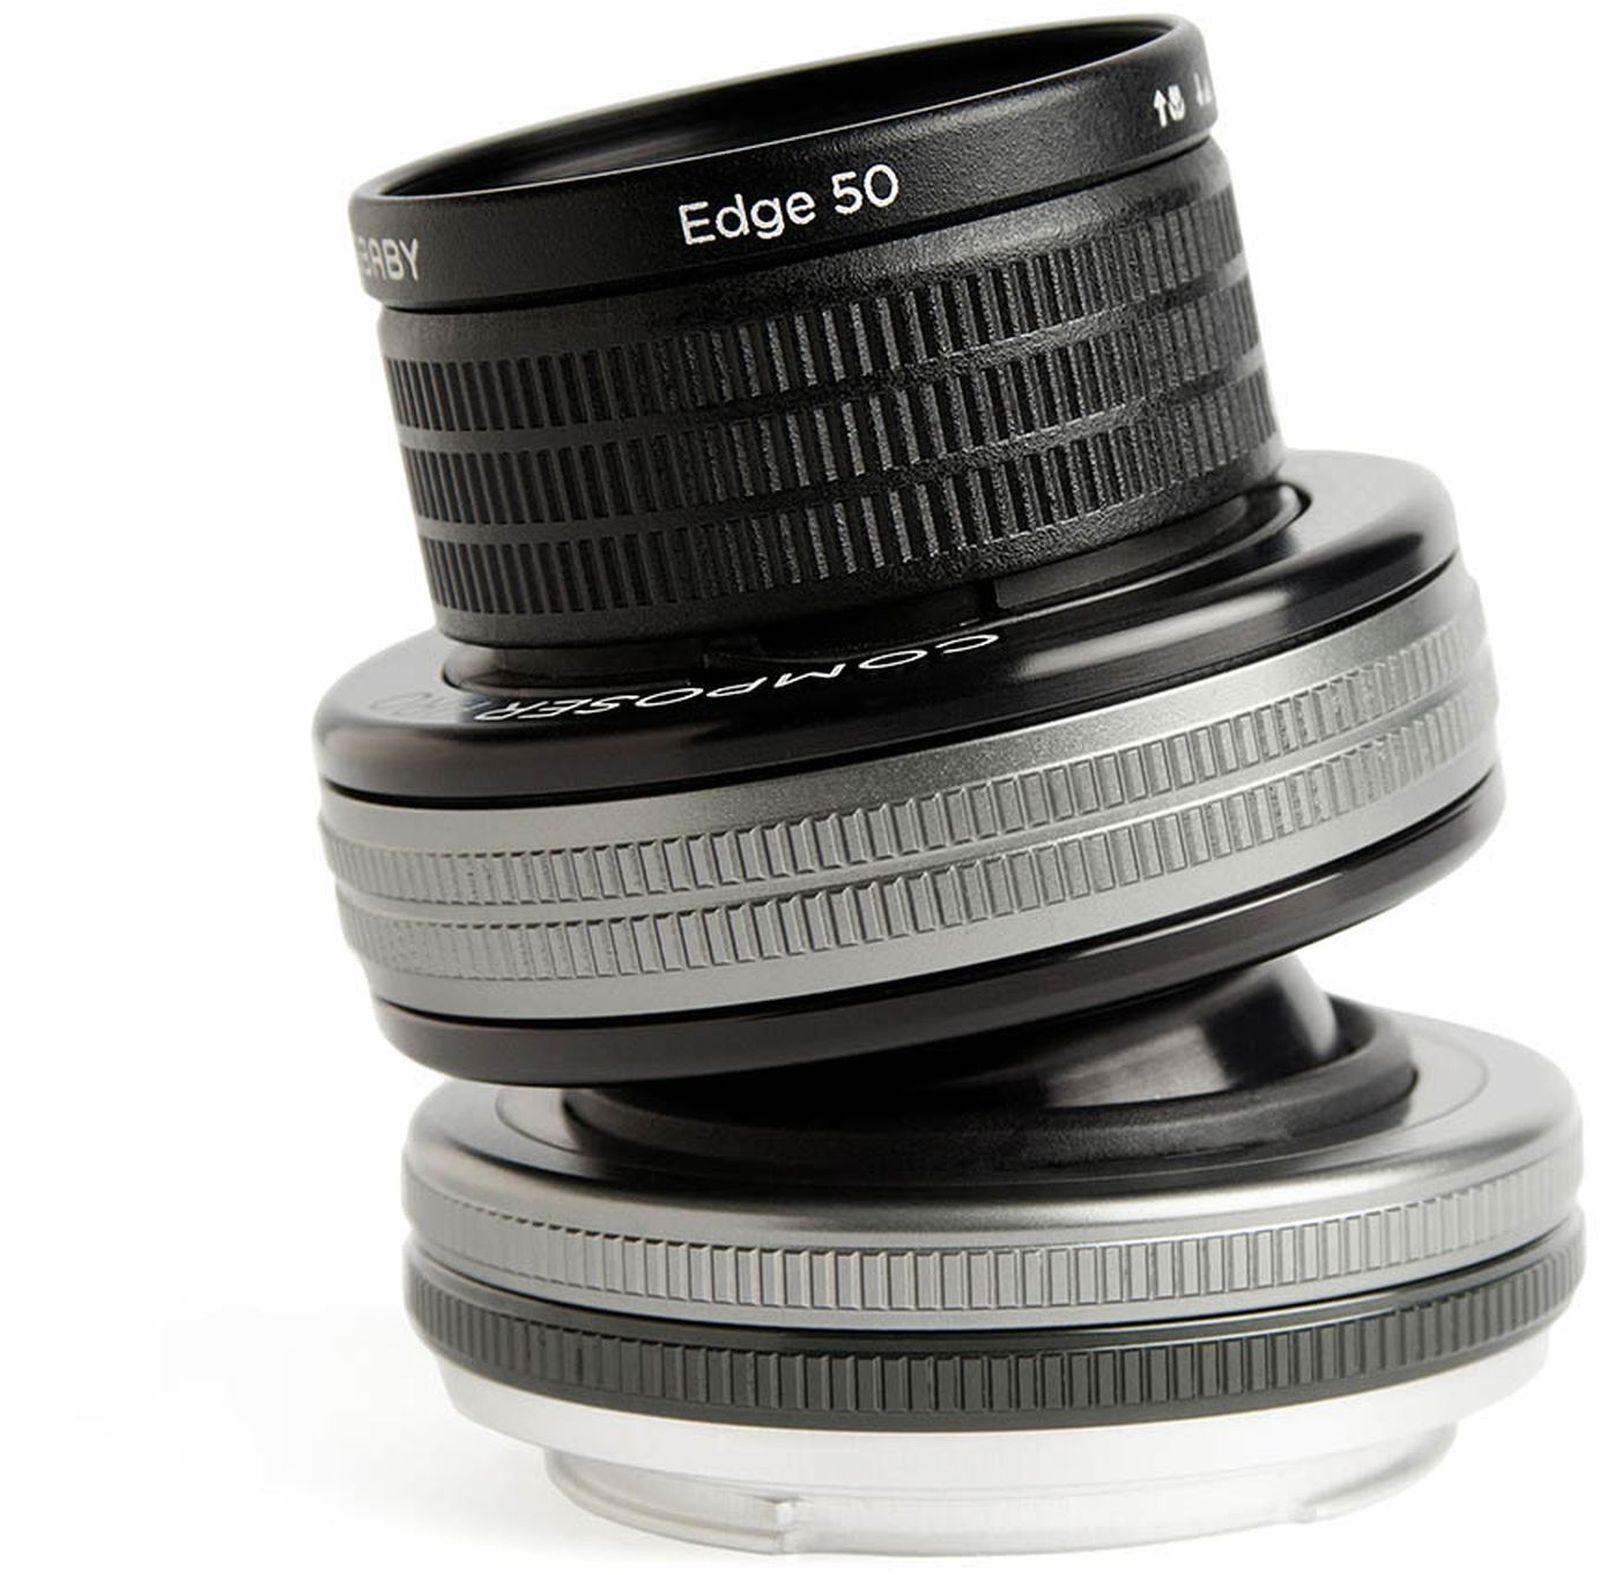 Объектив Lensbaby Composer Pro Double Glass 50mm f/4.0 для Micro 4/3, черный